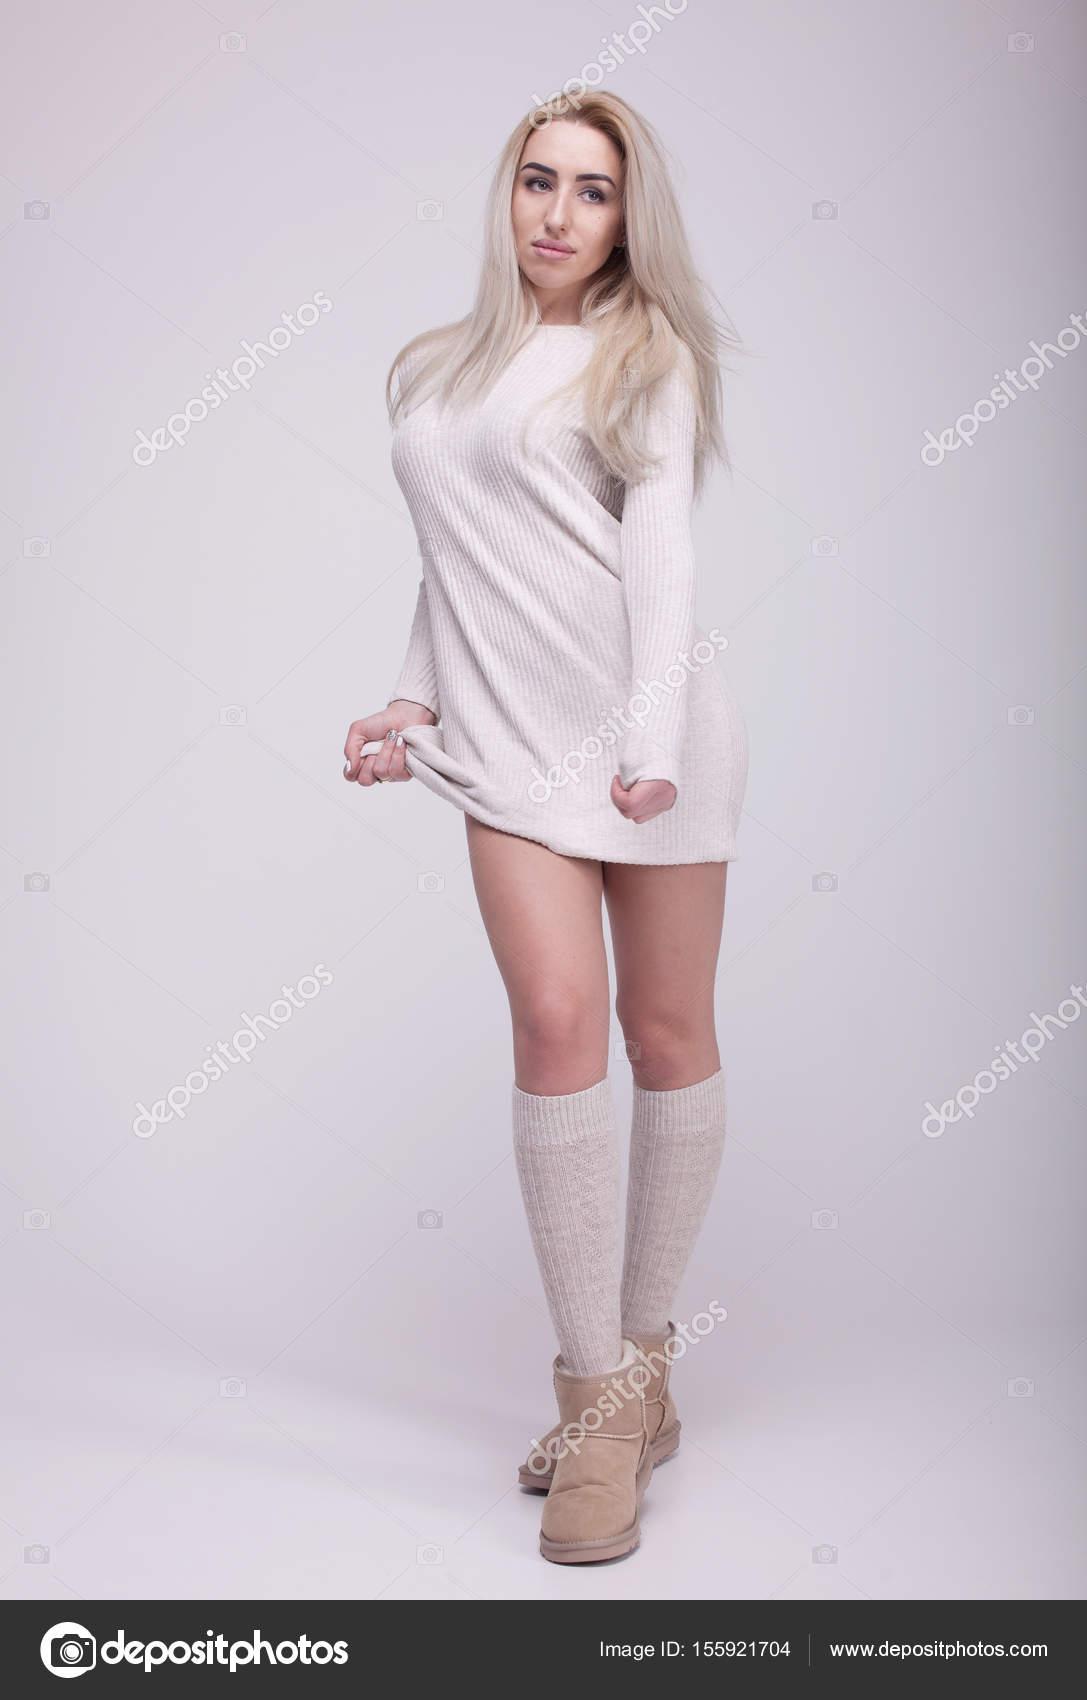 e6c625060240 Μόδα Μπότες χειμώνα. Ζεστά Χειμωνιάτικα γυναικεία ρούχα. Casual στυλ ...